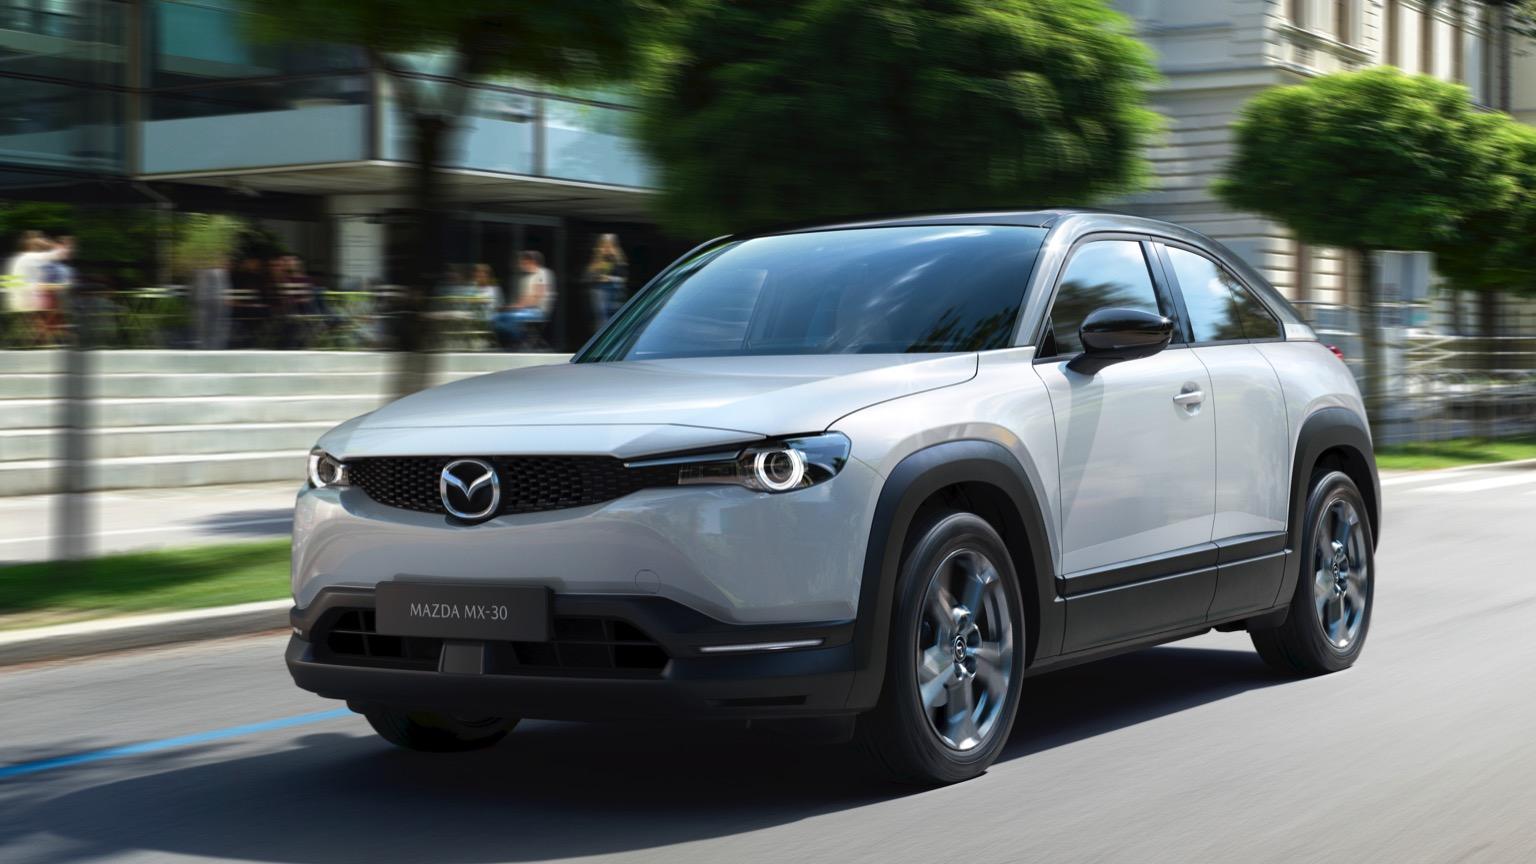 Kelebihan Kekurangan Mazda M Review